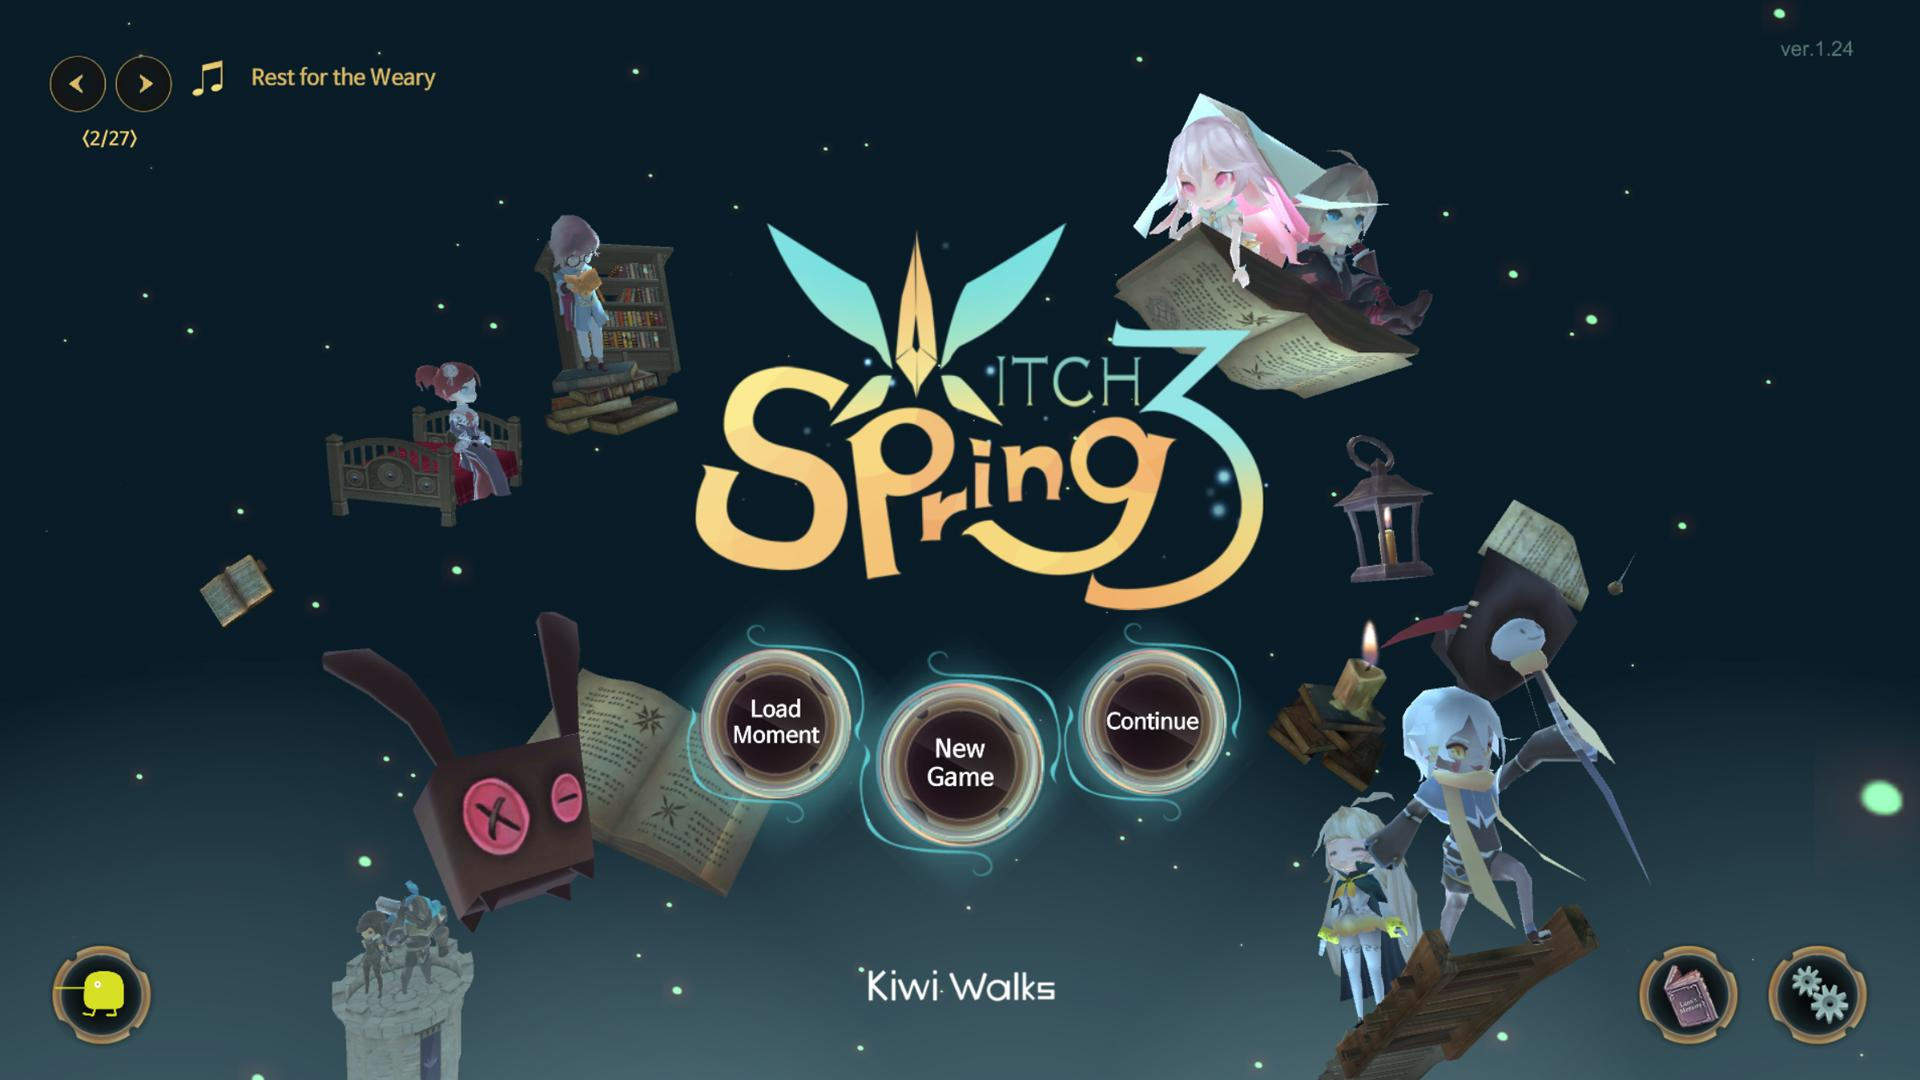 WitchSpring3 capture d'écran 1